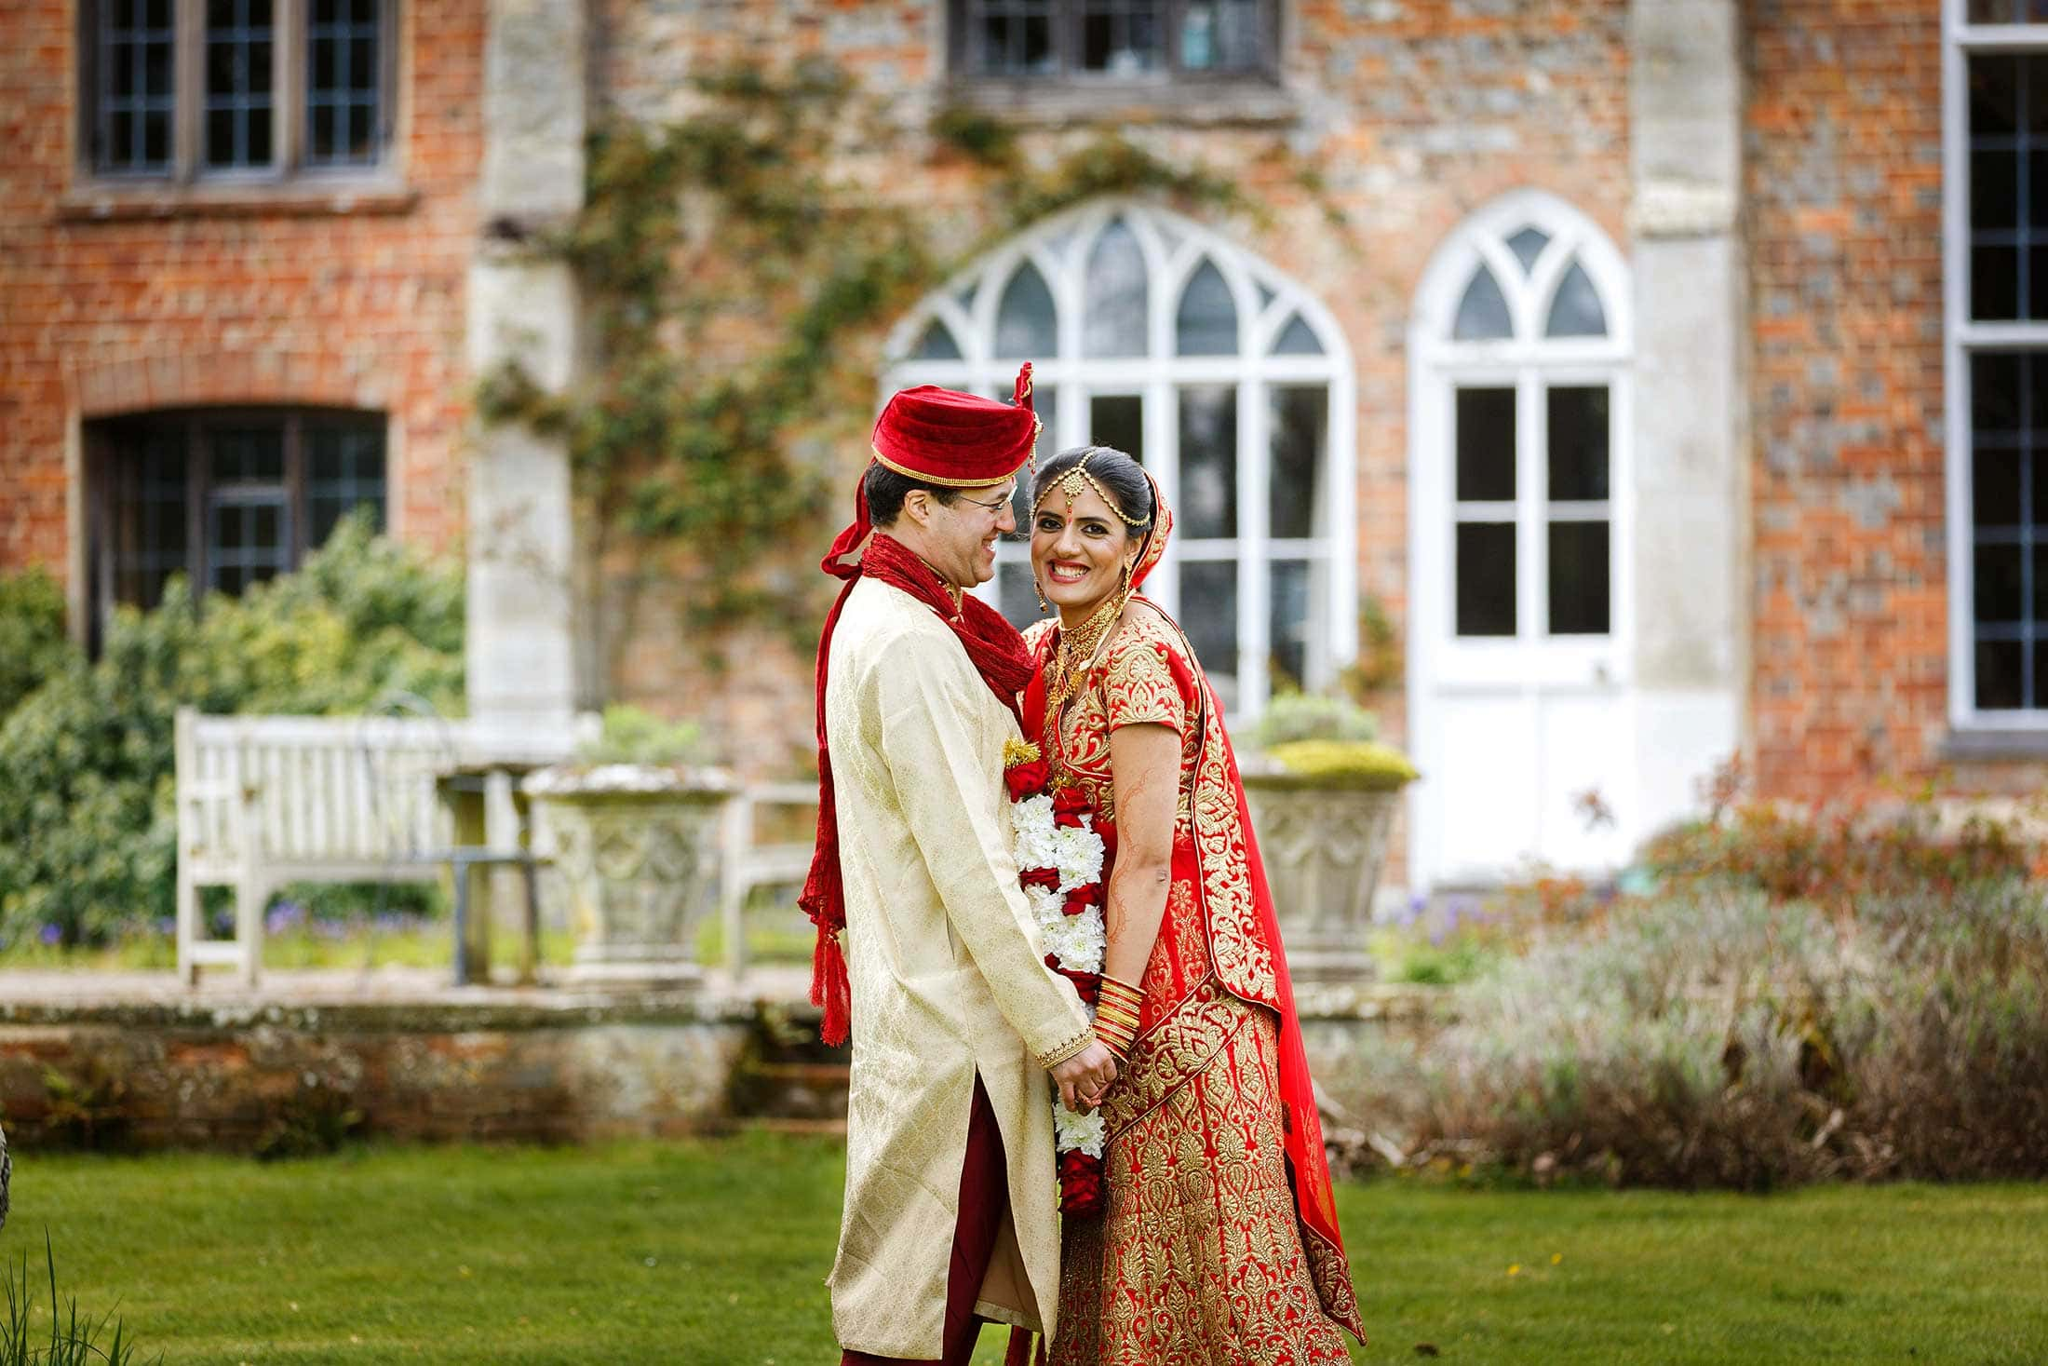 Nether Winchendon wedding of Nikki & Michael